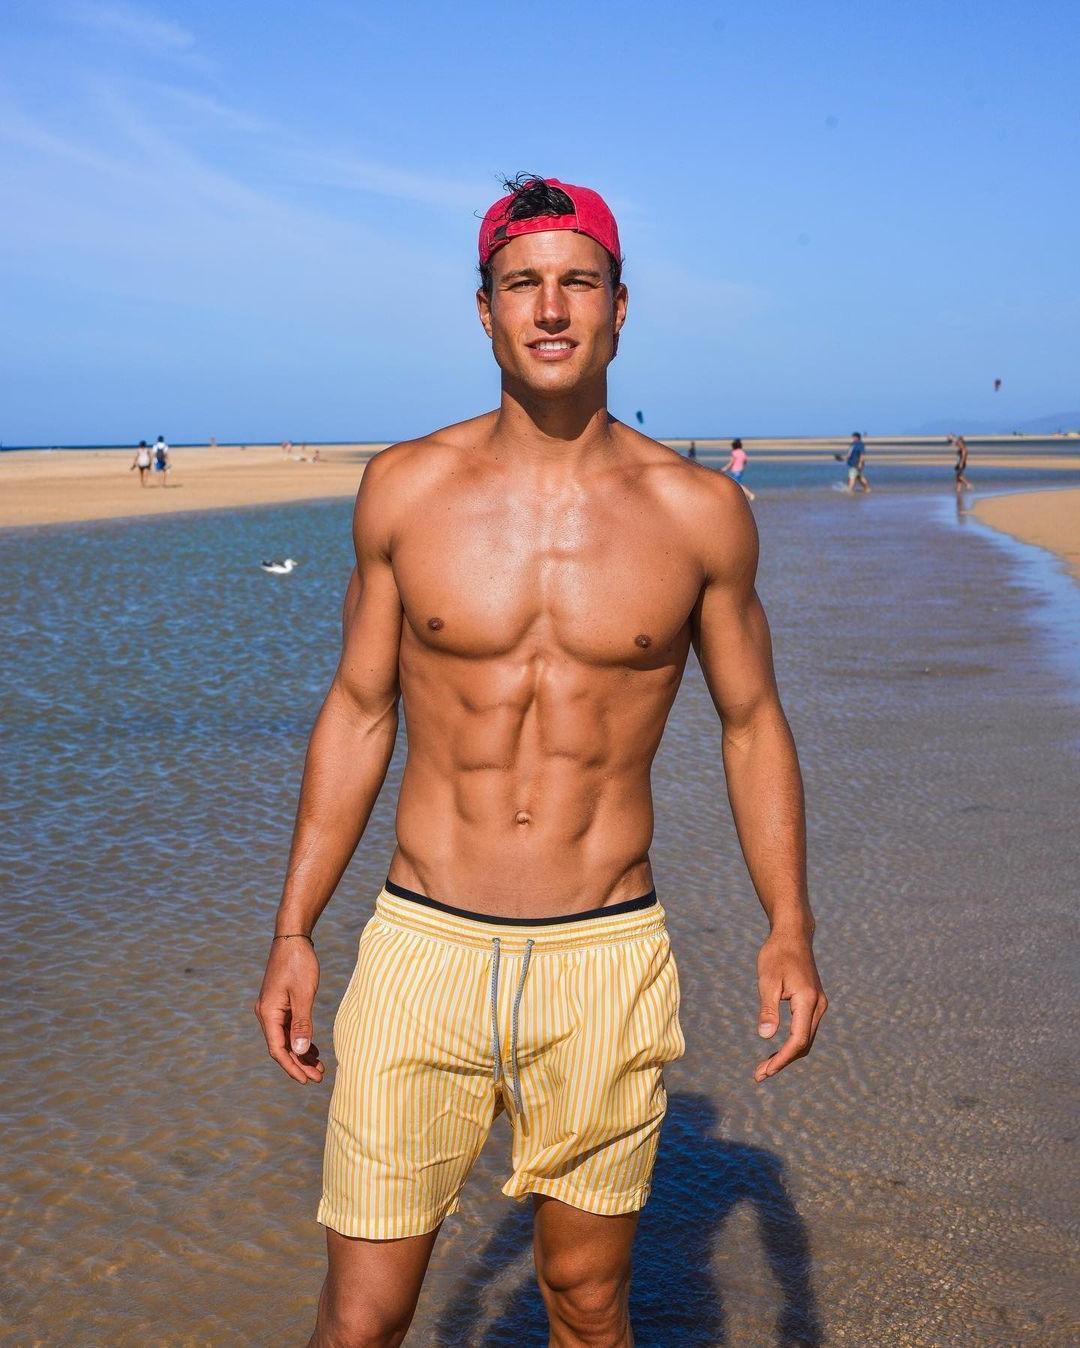 shirtless-muscle-abs-model-torben-konig-beach